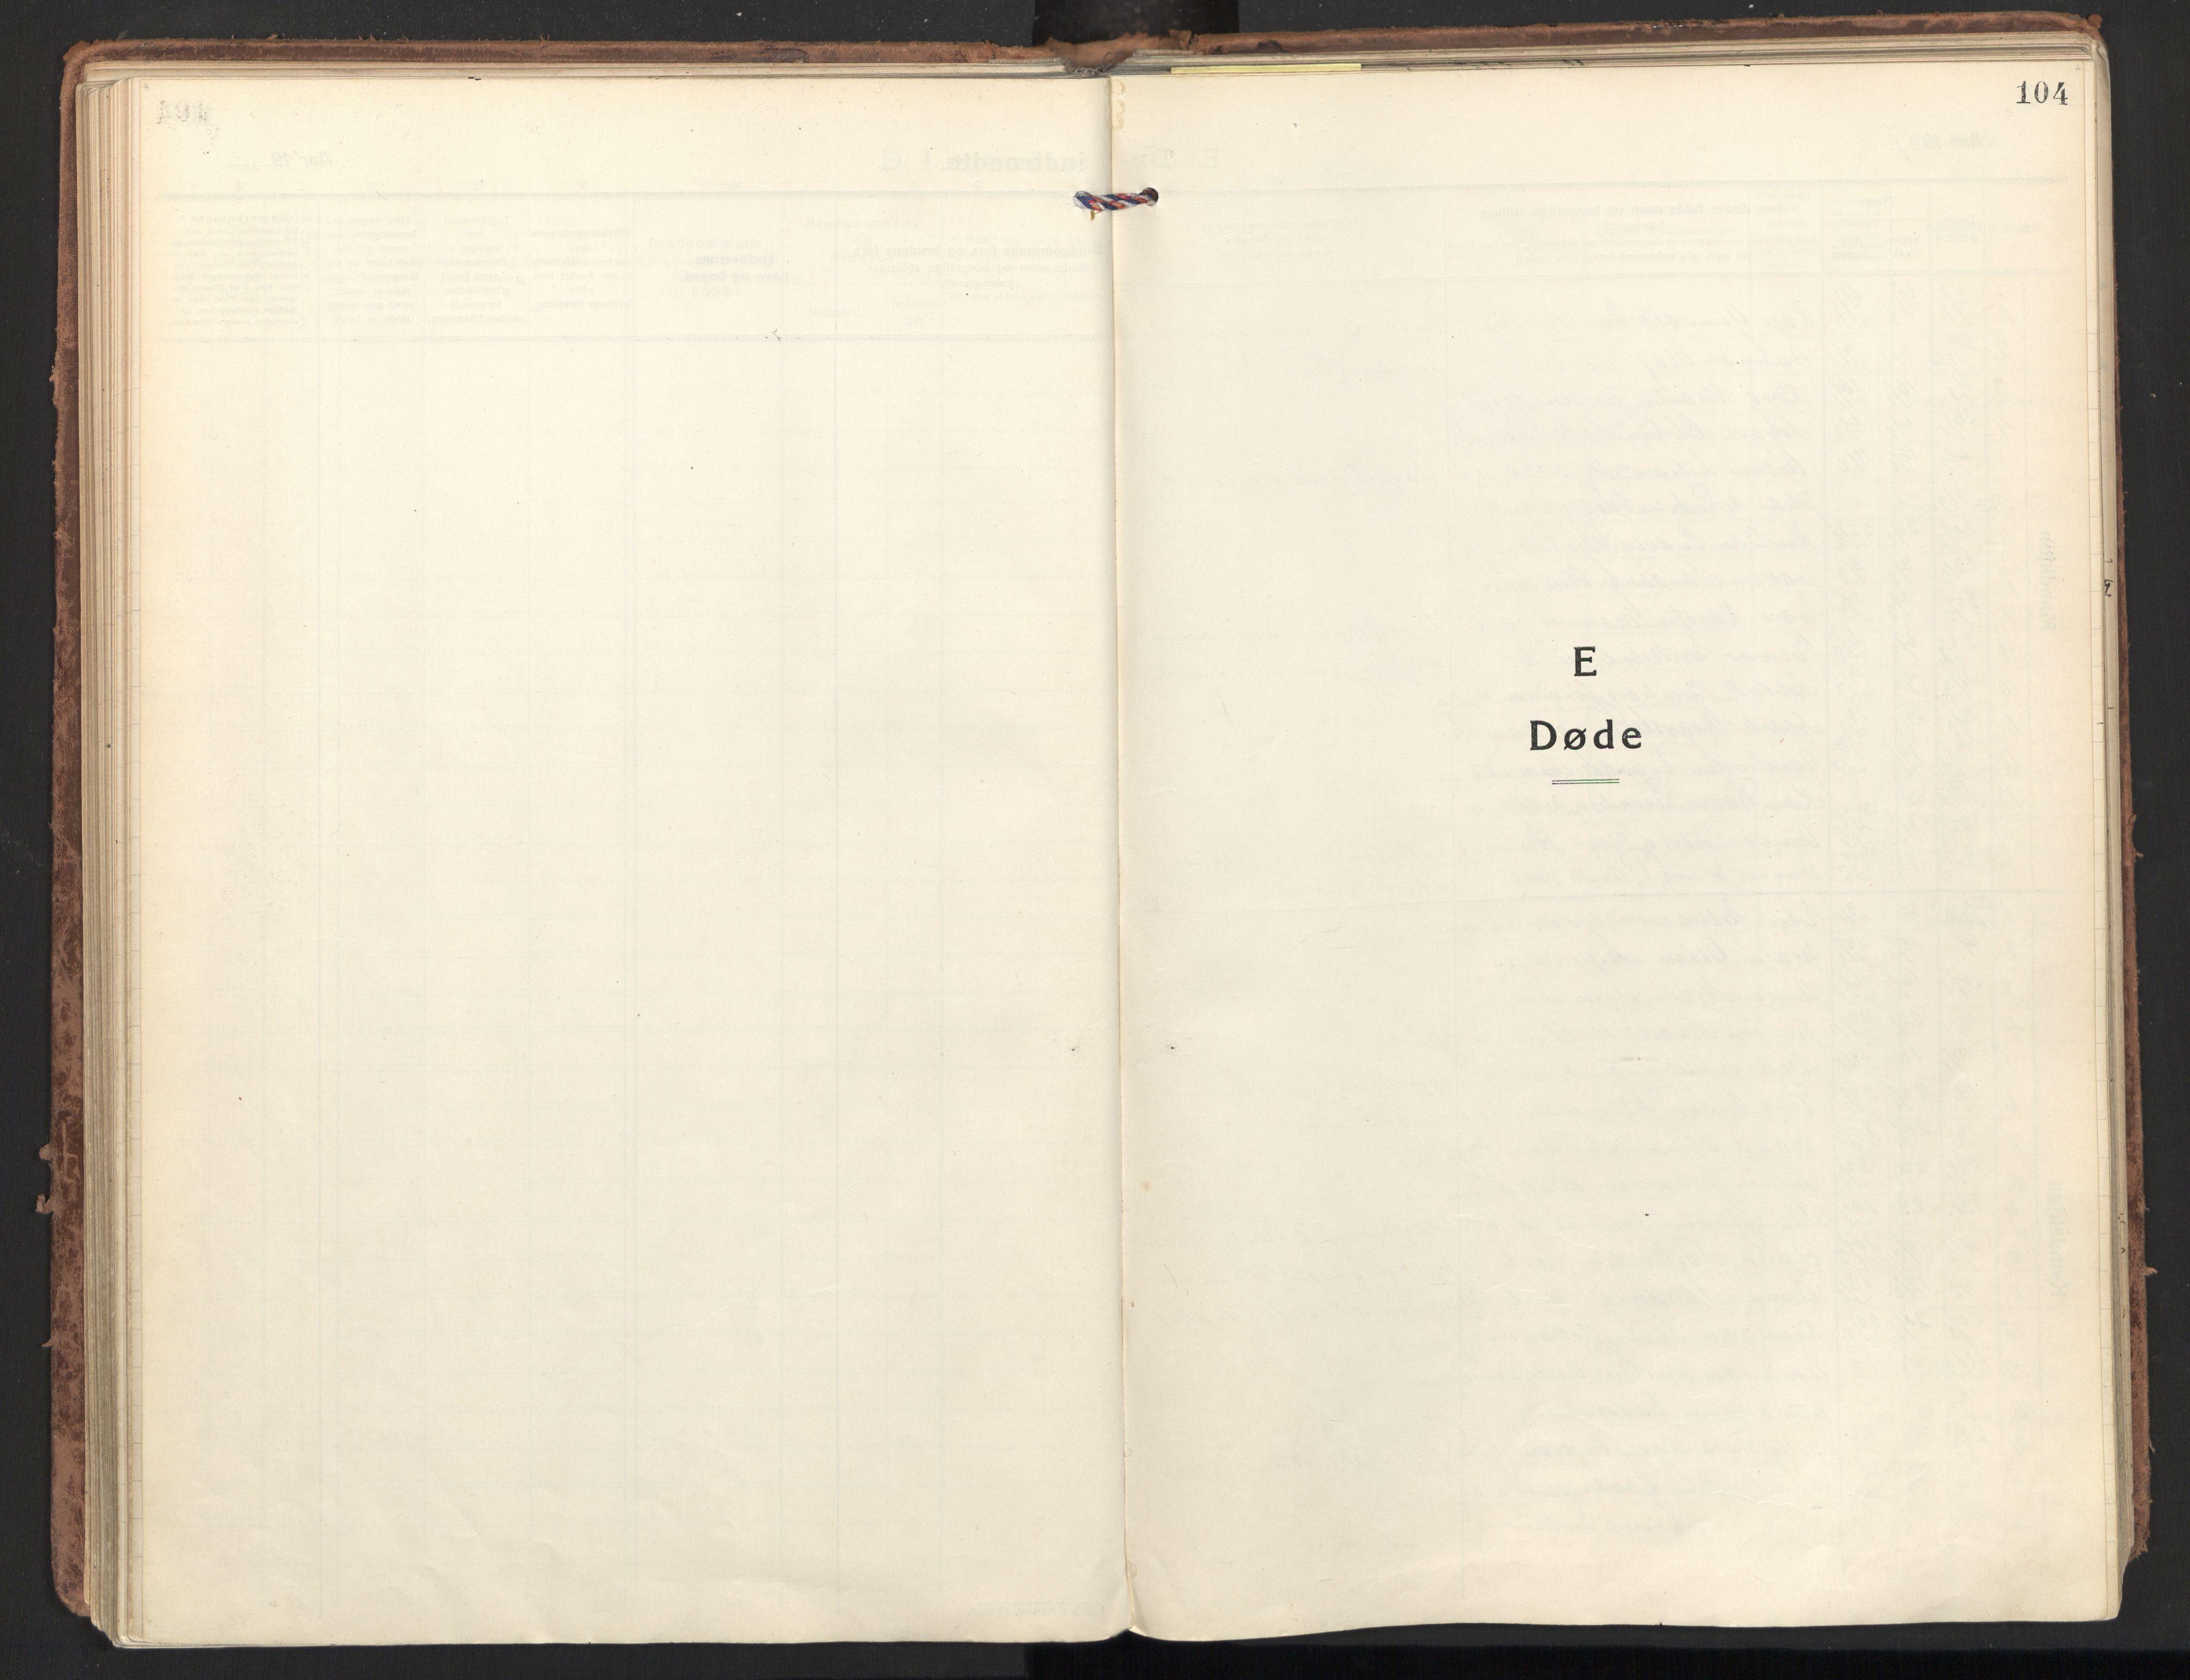 SAT, Ministerialprotokoller, klokkerbøker og fødselsregistre - Nordland, 801/L0018: Ministerialbok nr. 801A18, 1916-1930, s. 104